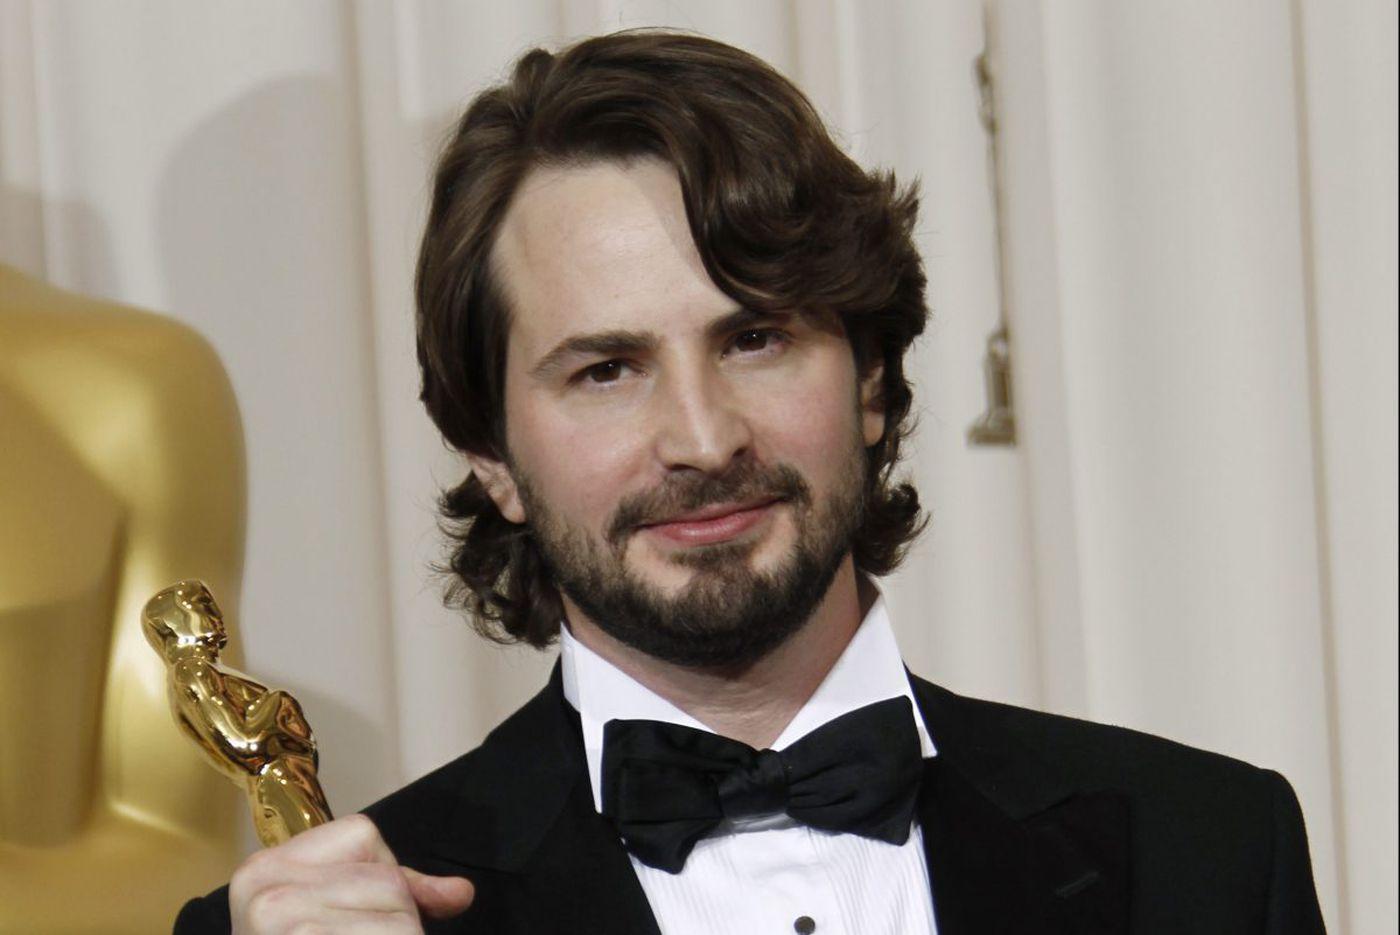 The shattered life that inspired Oscar-winning screenwriter Mark Boal to pen 'Detroit'